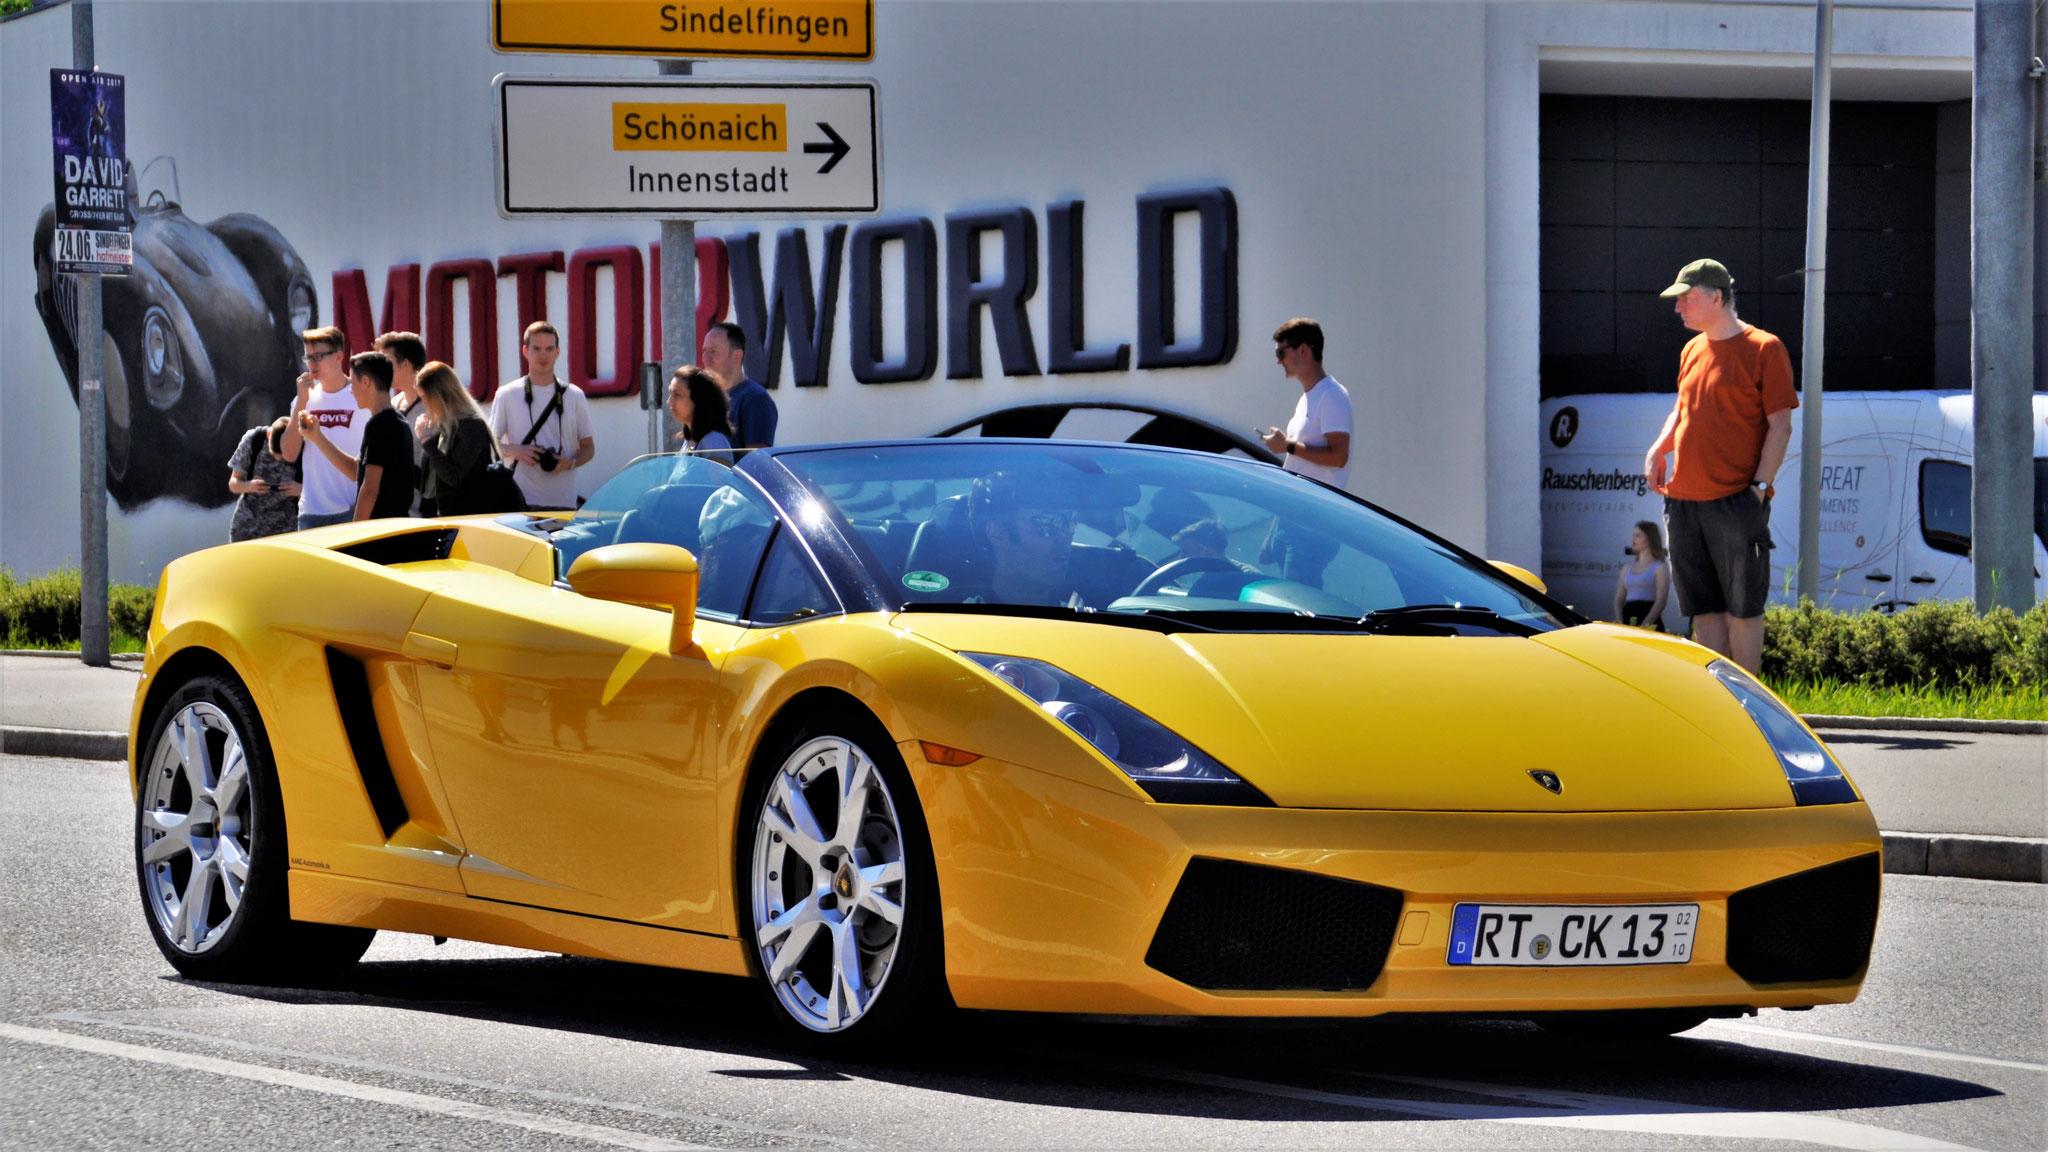 Lamborghini Gallardo Spyder - RT-CK-13